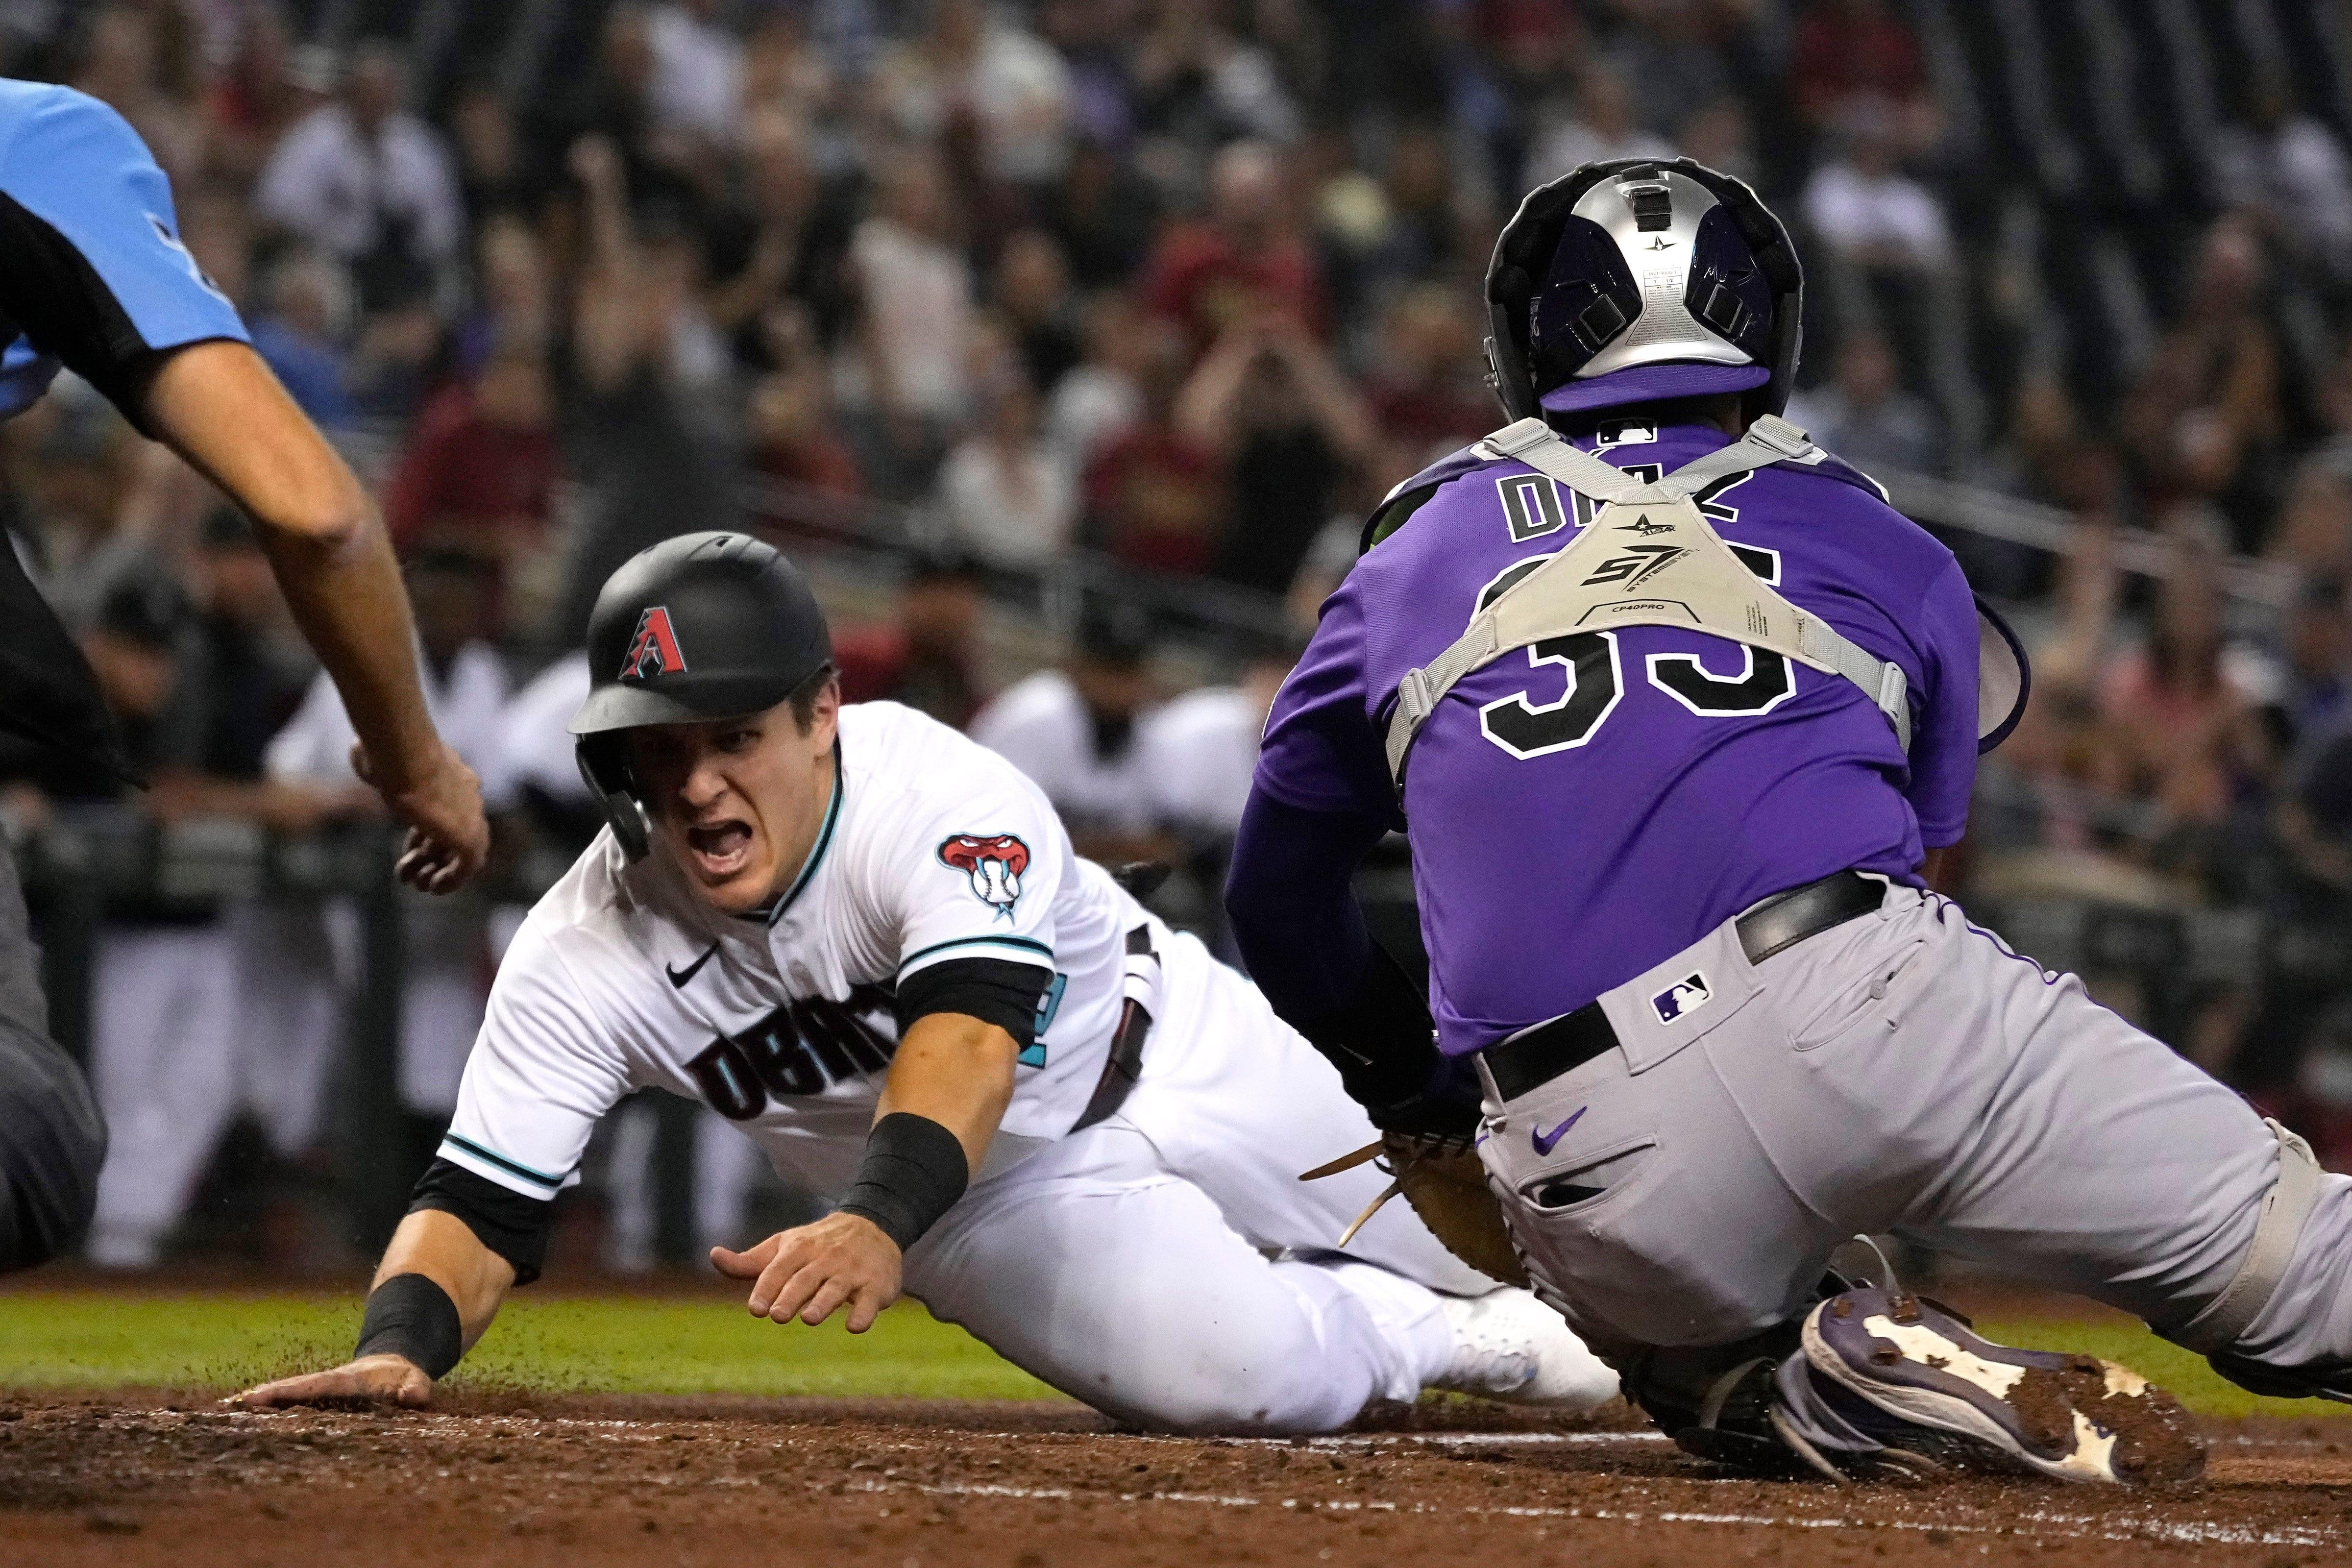 Pitcher homers, but Diamondbacks lose seven-run lead in loss to Rockies